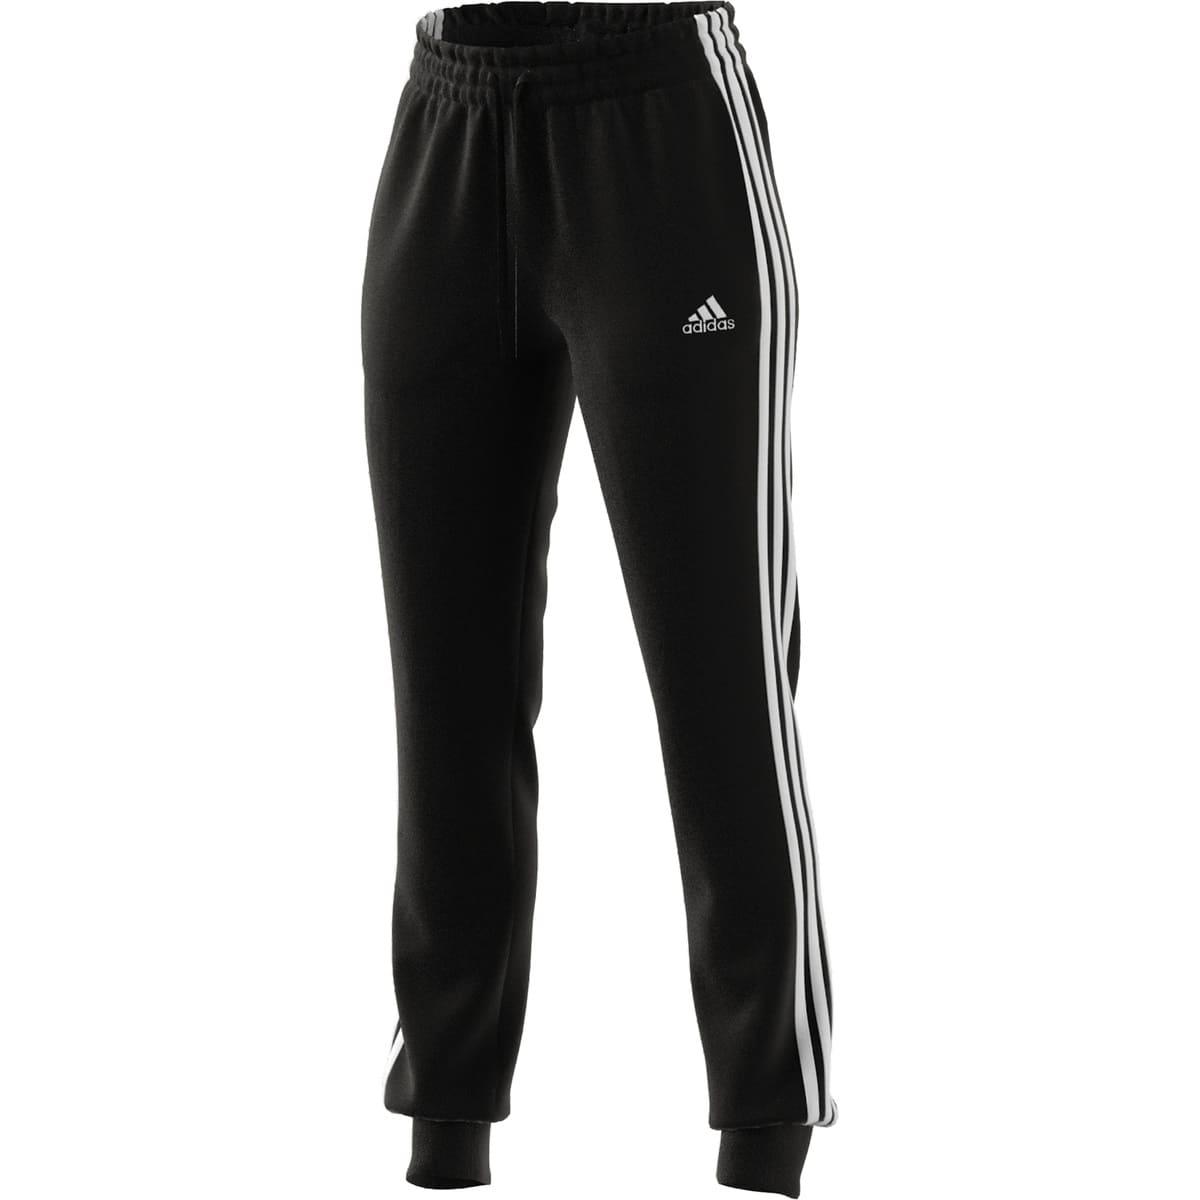 ADIDAS WOMEN 3S FT C PANTS BLACK/WHITE - S